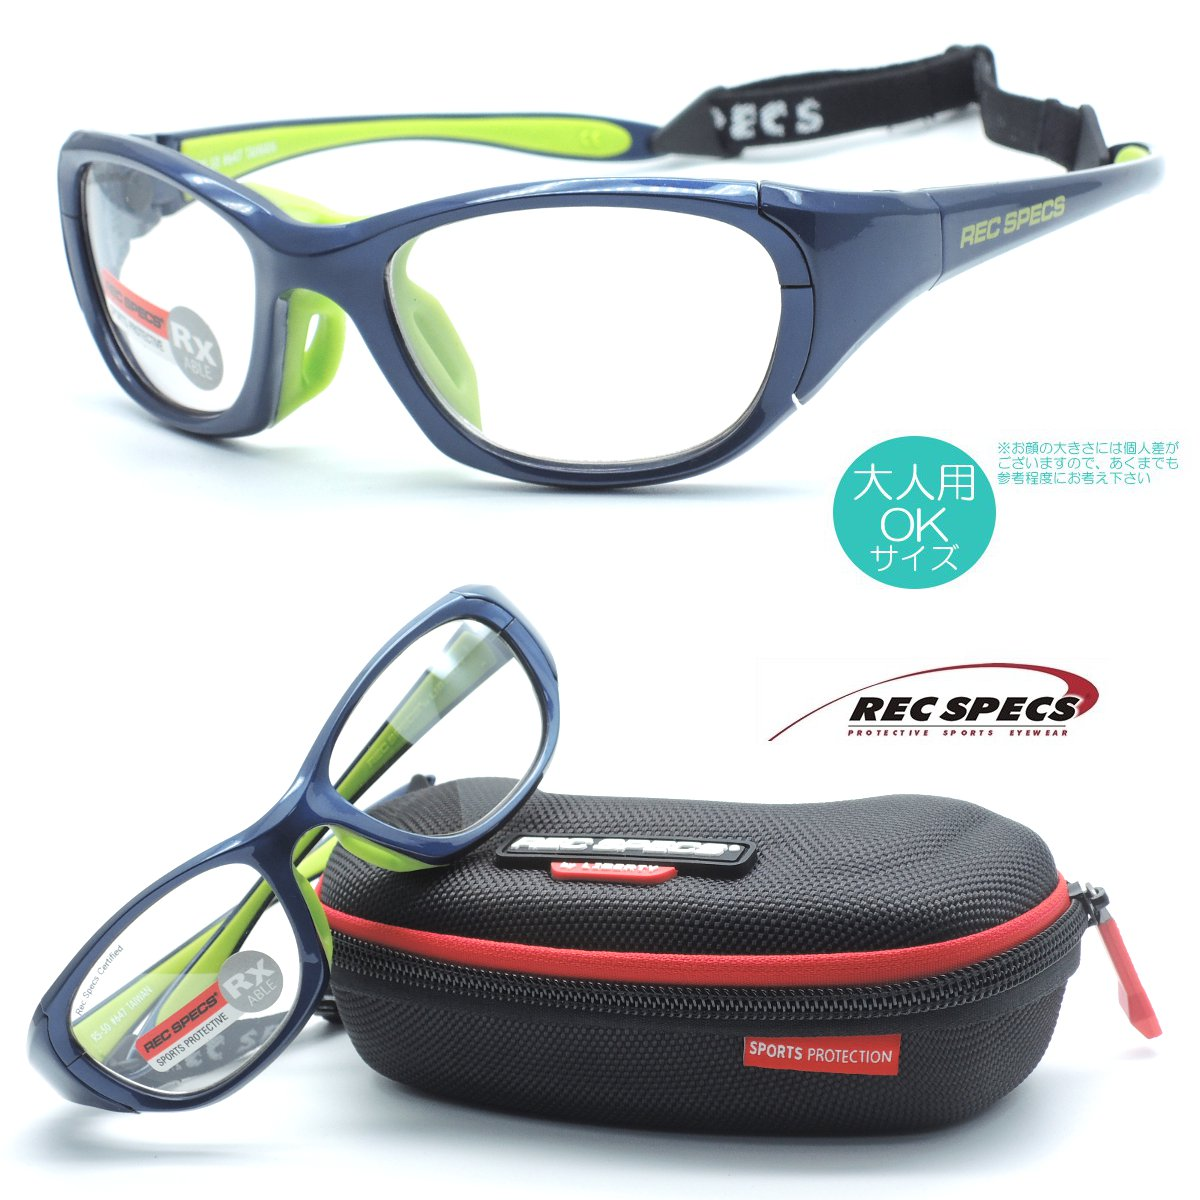 【REC SPECS】レックスペックス RS-50 #647 55サイズ ネイビー 子供用スポーツアイウエア 大人も使用可能サイズ 度付レンズ込【正規品】【店内全品送料無料】スポーツゴーグル カッコイイキッズメガネ